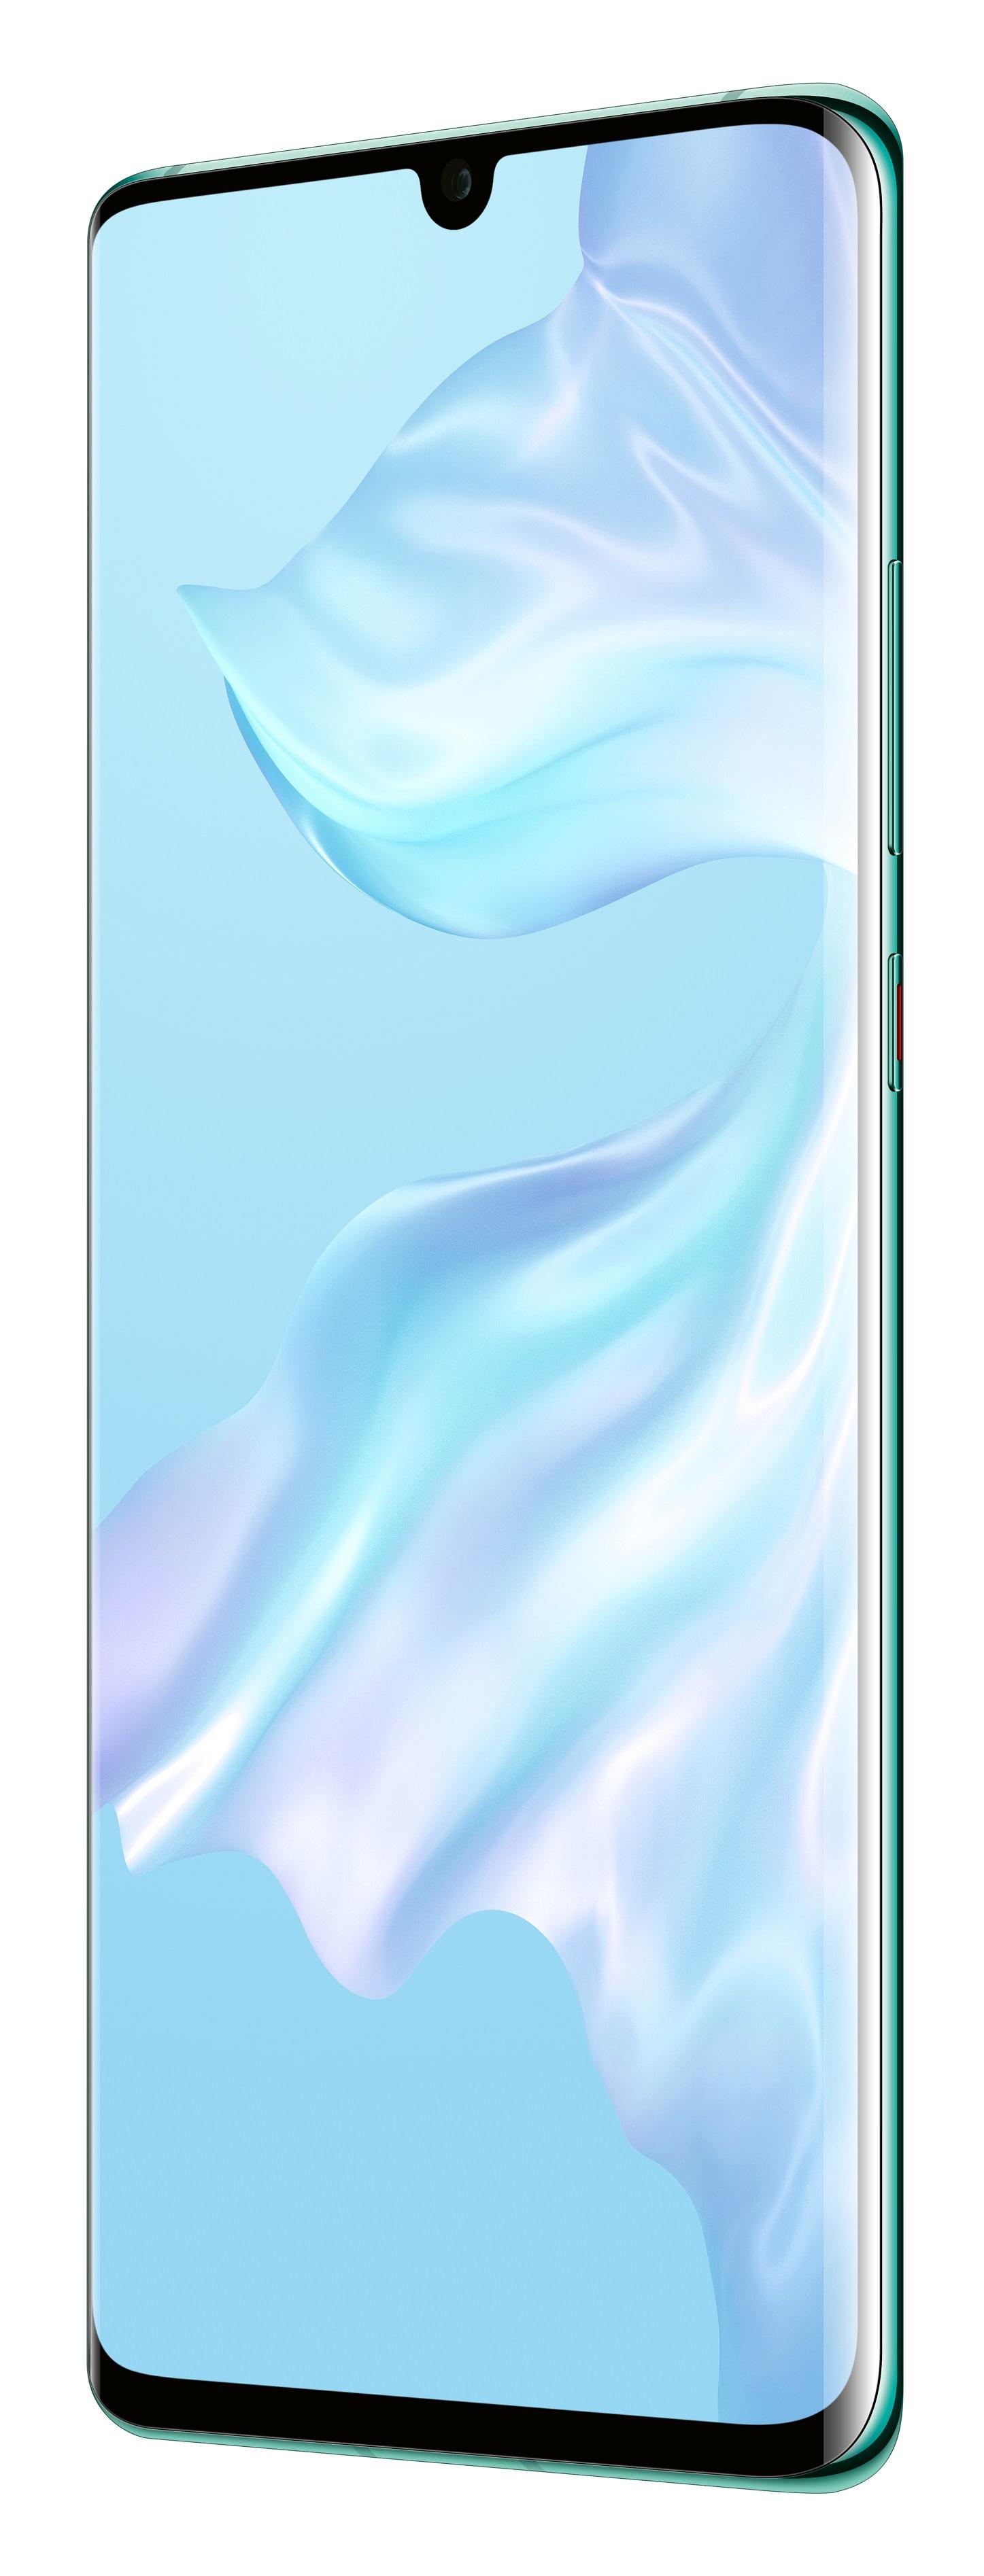 Huawei P30 pro Aurora Telekom, Quad Camera, Leica, Android 9, BRANDNEU